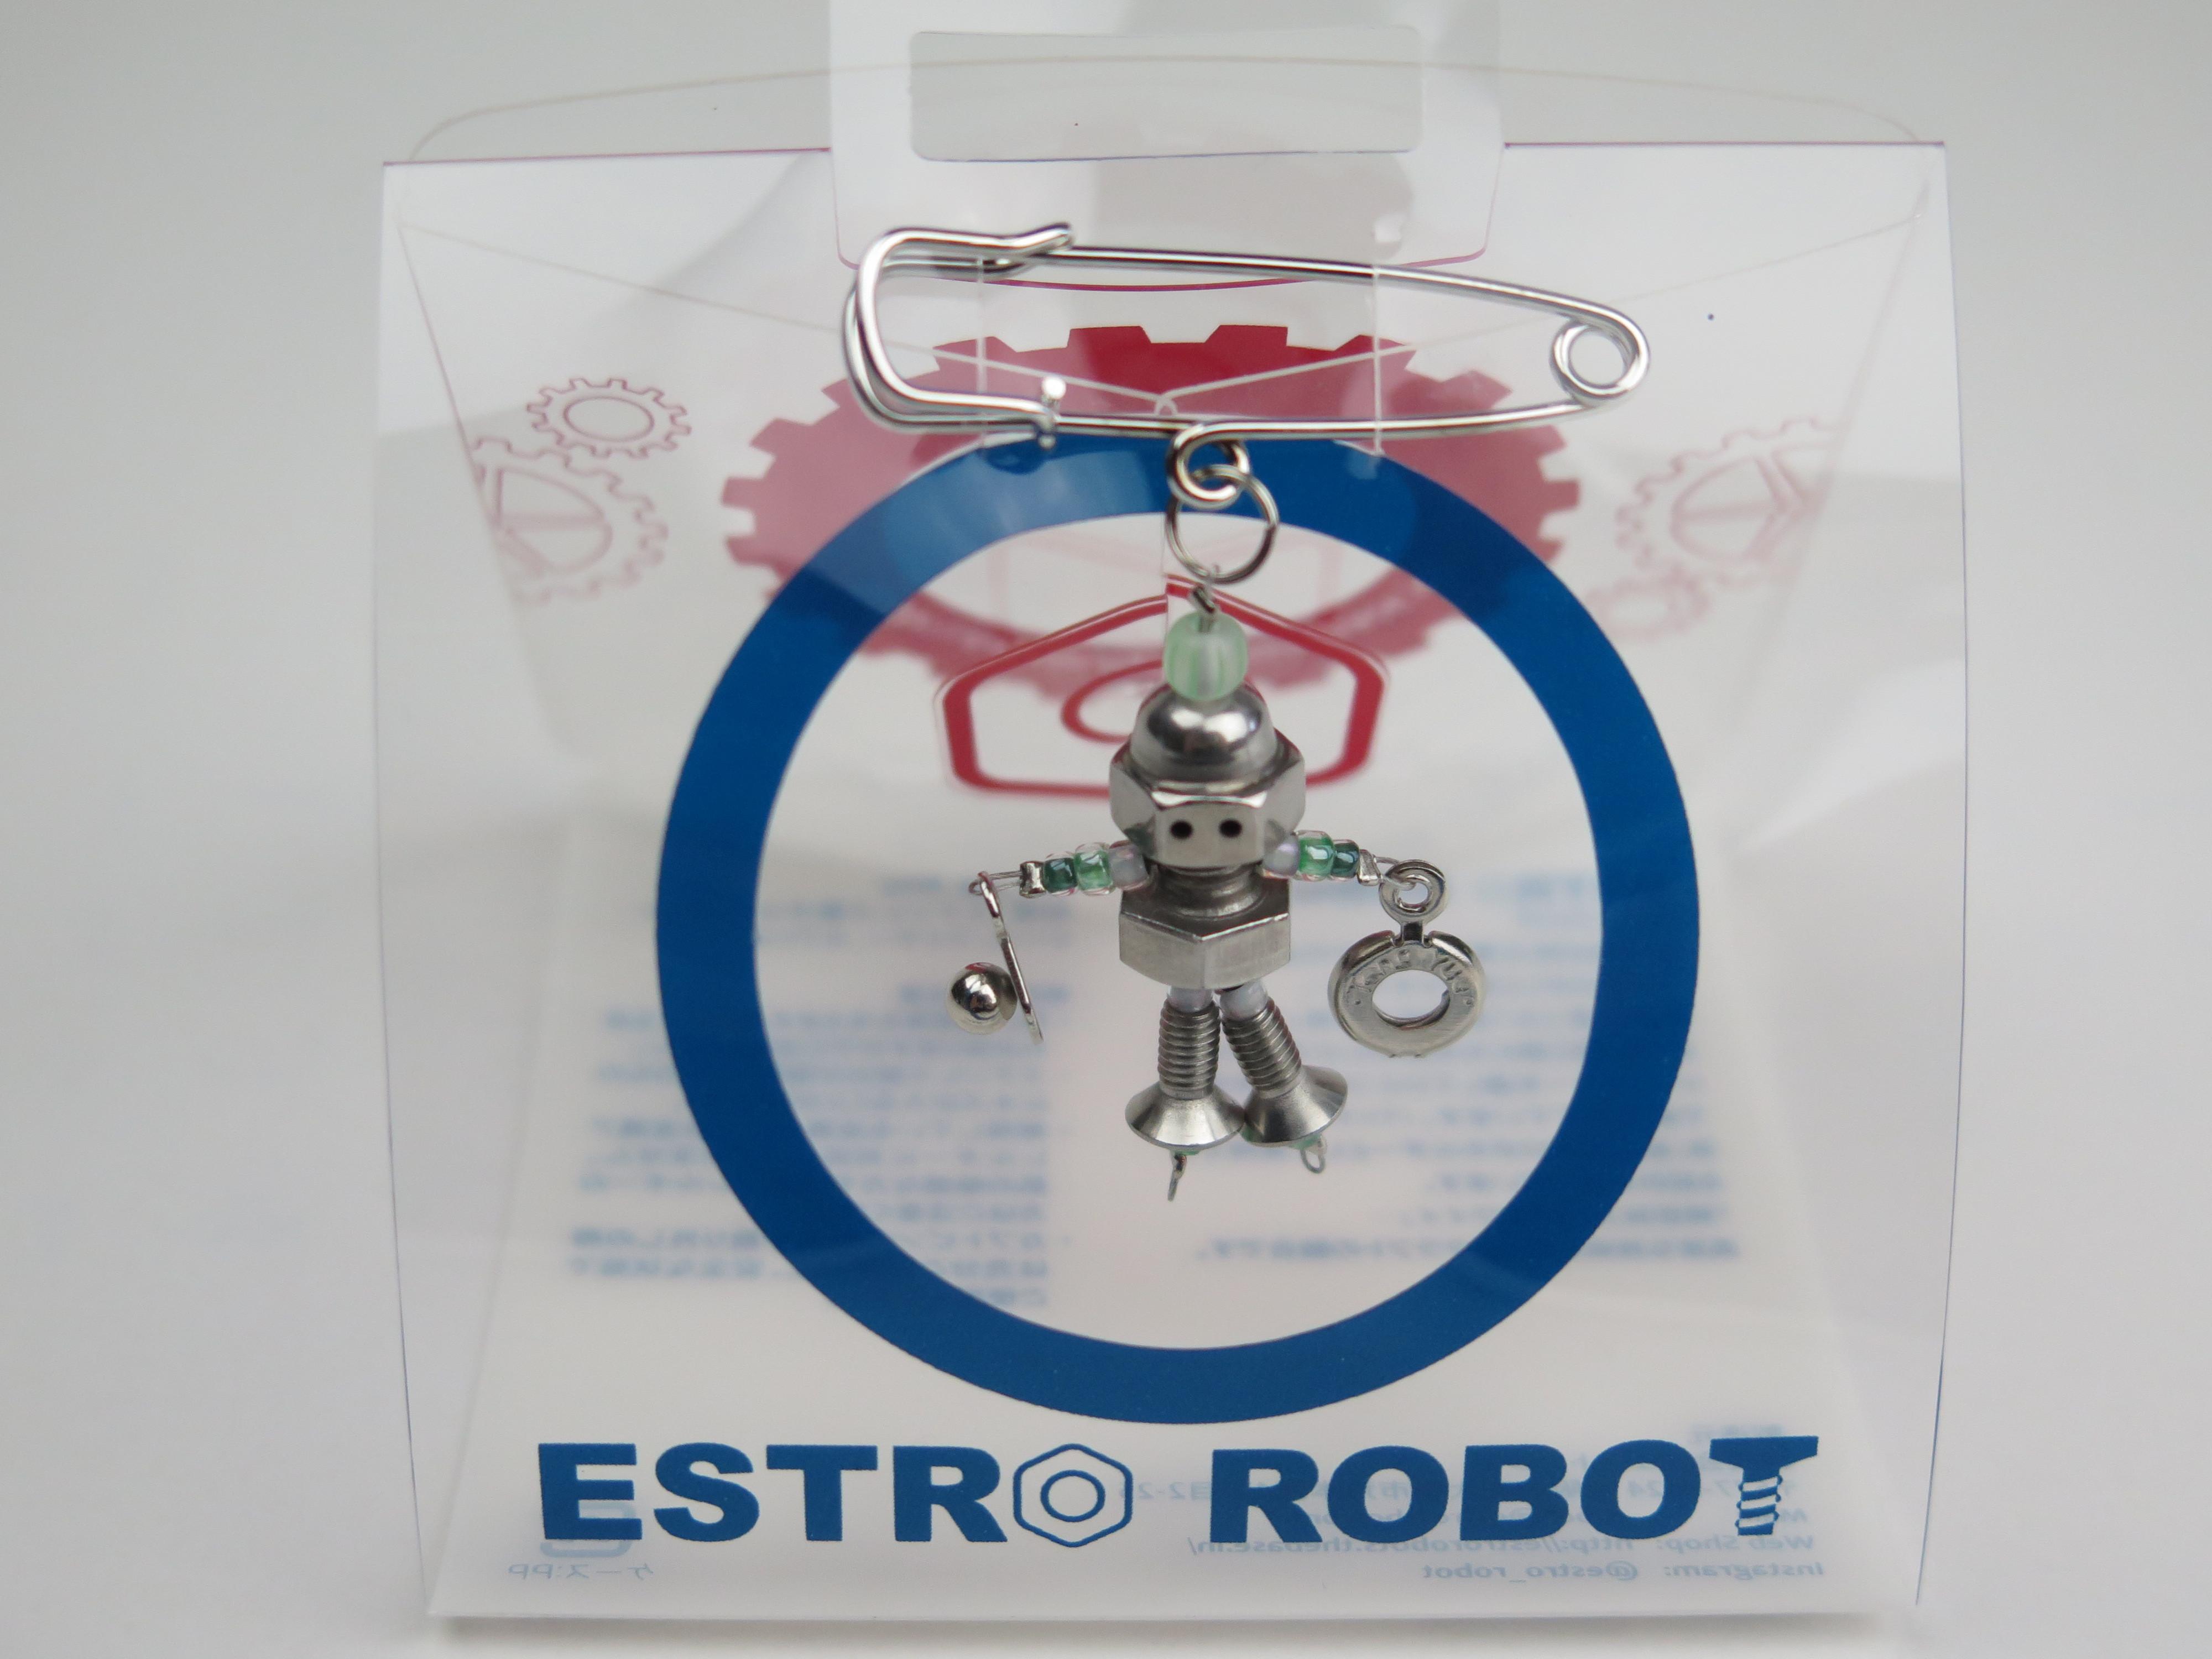 estro robot green グリーン